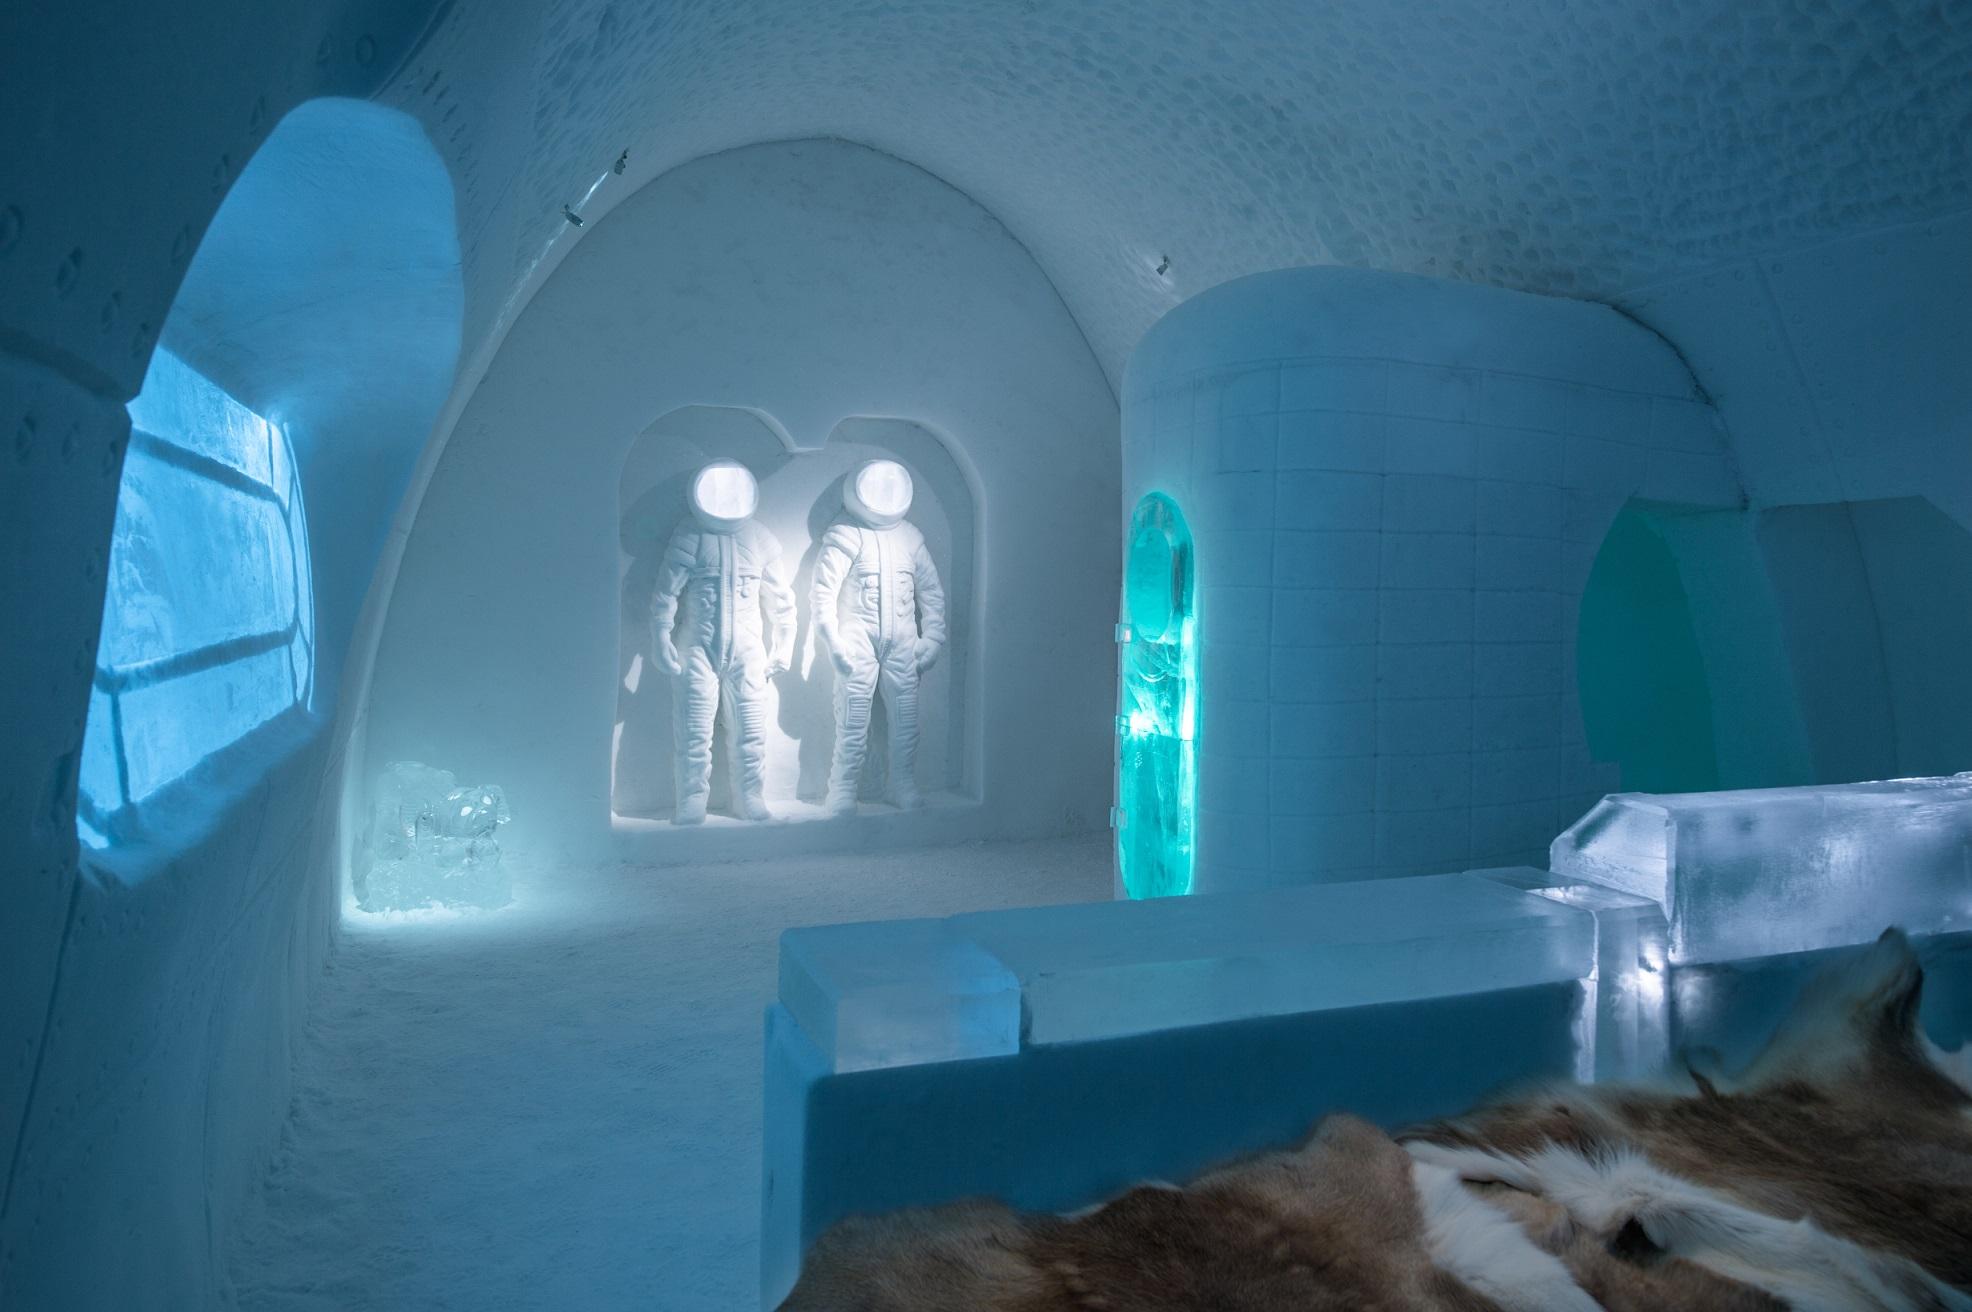 ICEHOTEL 28 2017 2018 Art Suite Space Room. Design Adrian Bois Pablo Lopez. Photo Asaf Kliger. 2